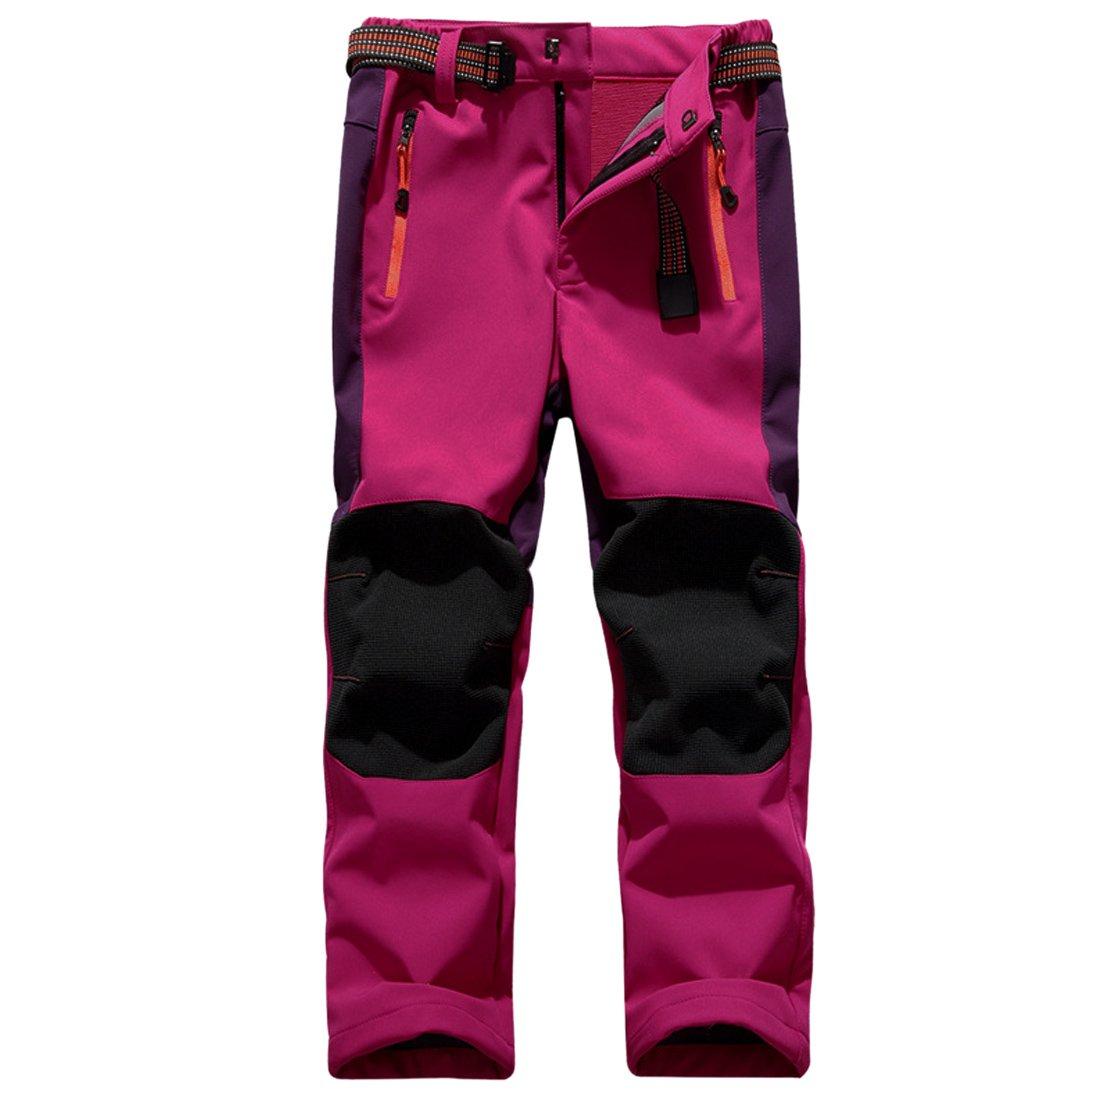 Sidiou Group Deporte al Aire Libre Pantalones de Trekking Niño Pantalones de Montaña Softshell Pantalones Impermeable Pantalones Senderismo Niña Pantalones de Escalada Chicas Pantalones Forro Polar